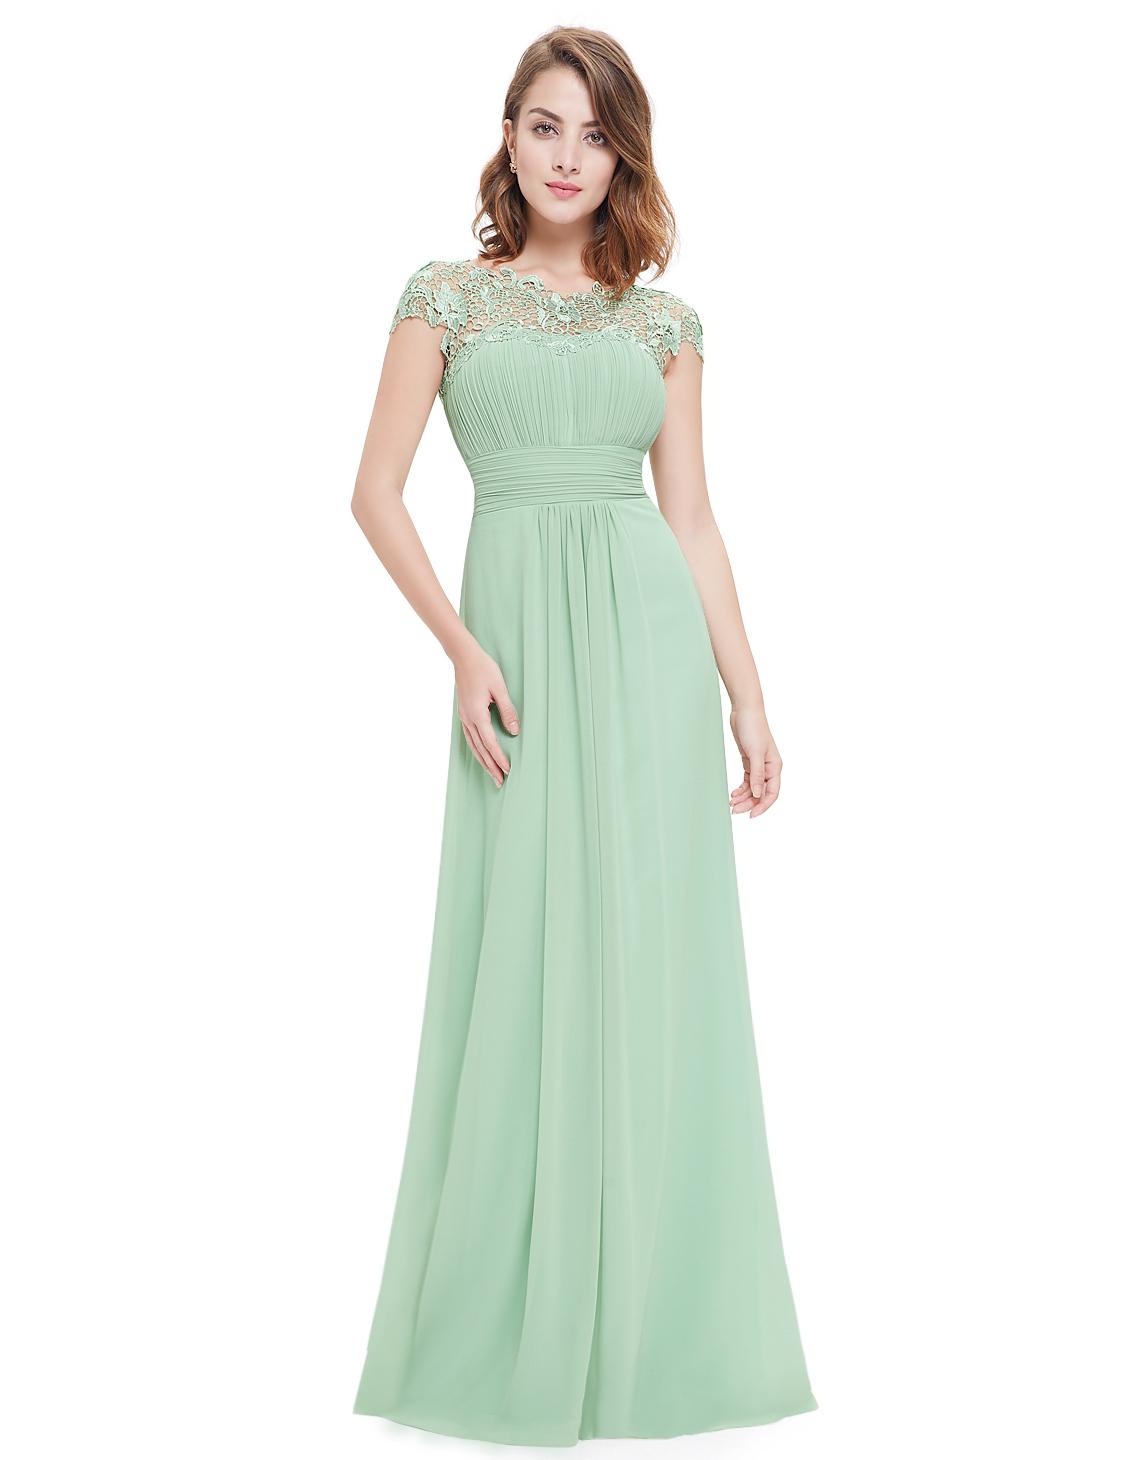 Chiffong klänning med spets - Marina´s Boutique 46989ee26f5f6